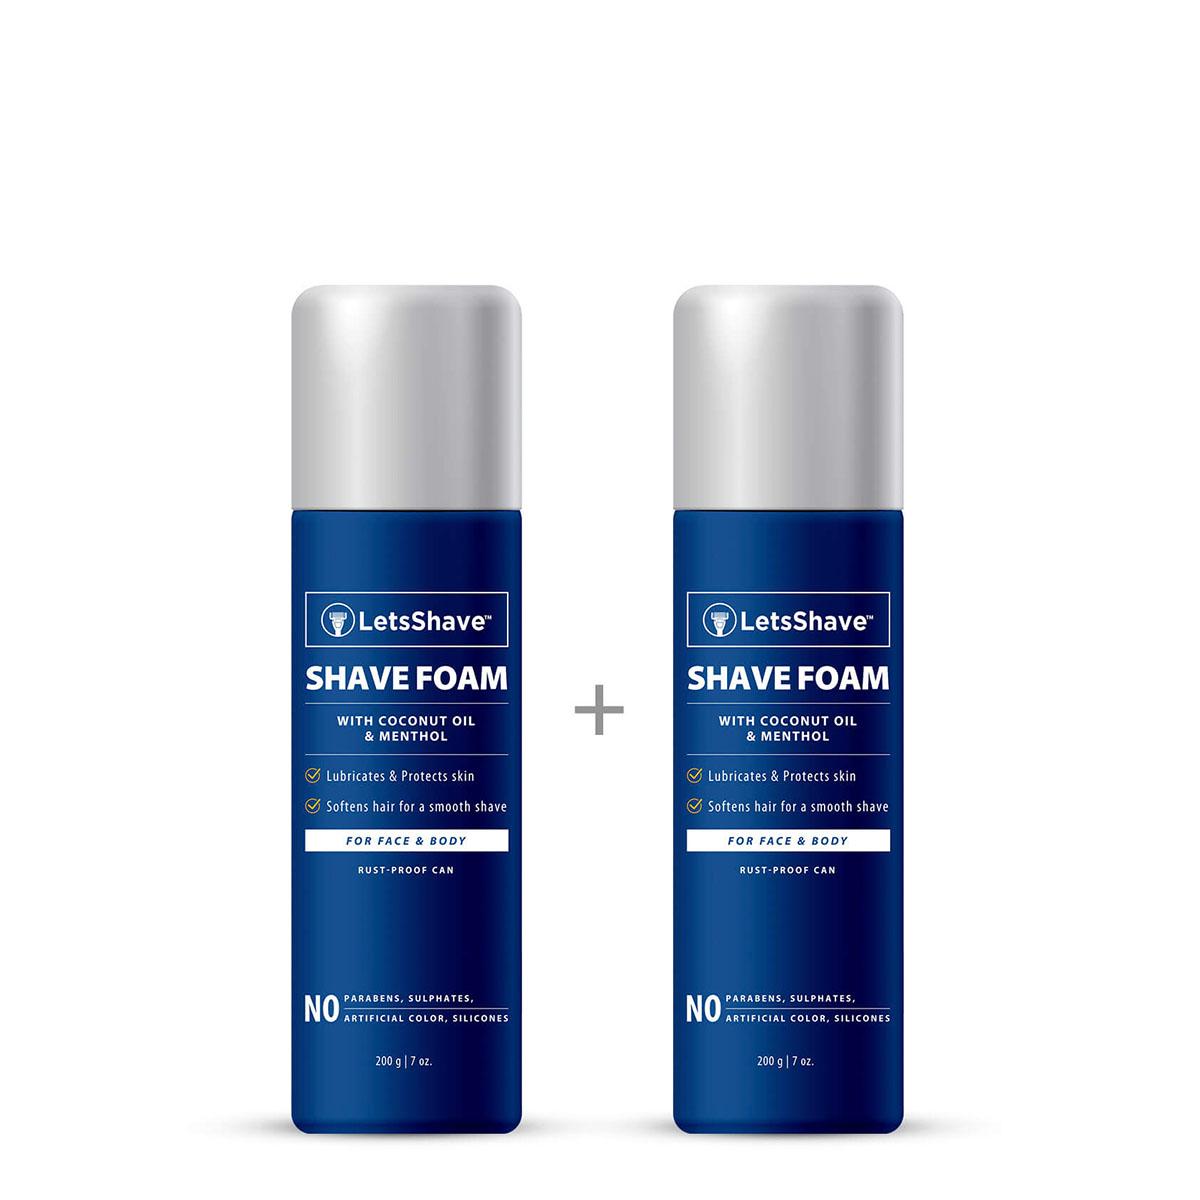 LetsShave   LetsShave Shave Foam - Coconut Oil Enriched - Rust Proof Aluminium Bottle - Paraben and Sulphate Free - 200 g (1 + 1 FREE)